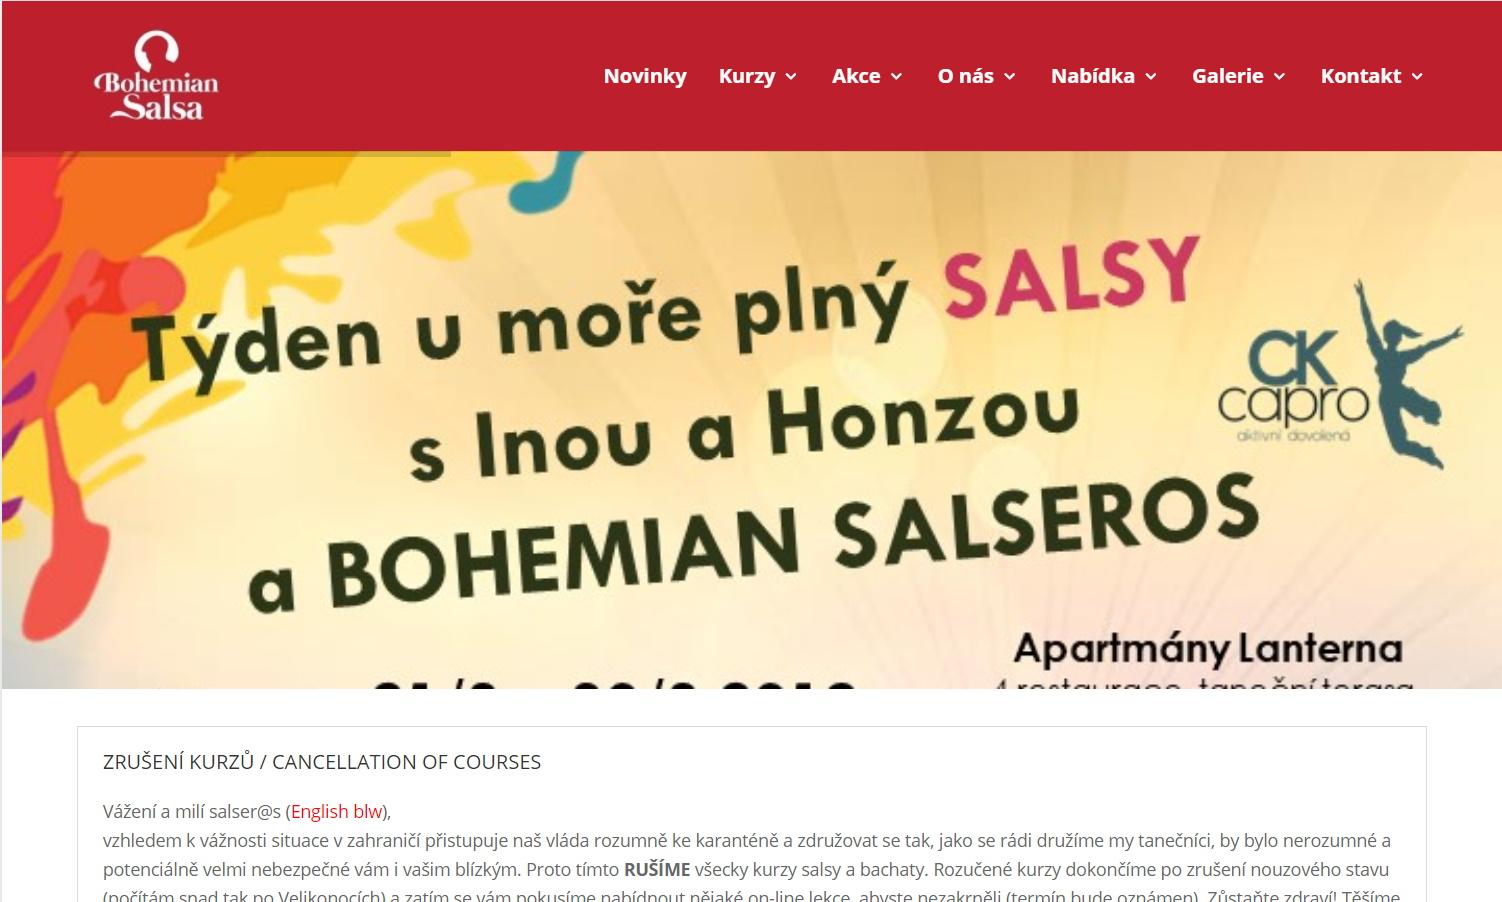 Bohemian salsa